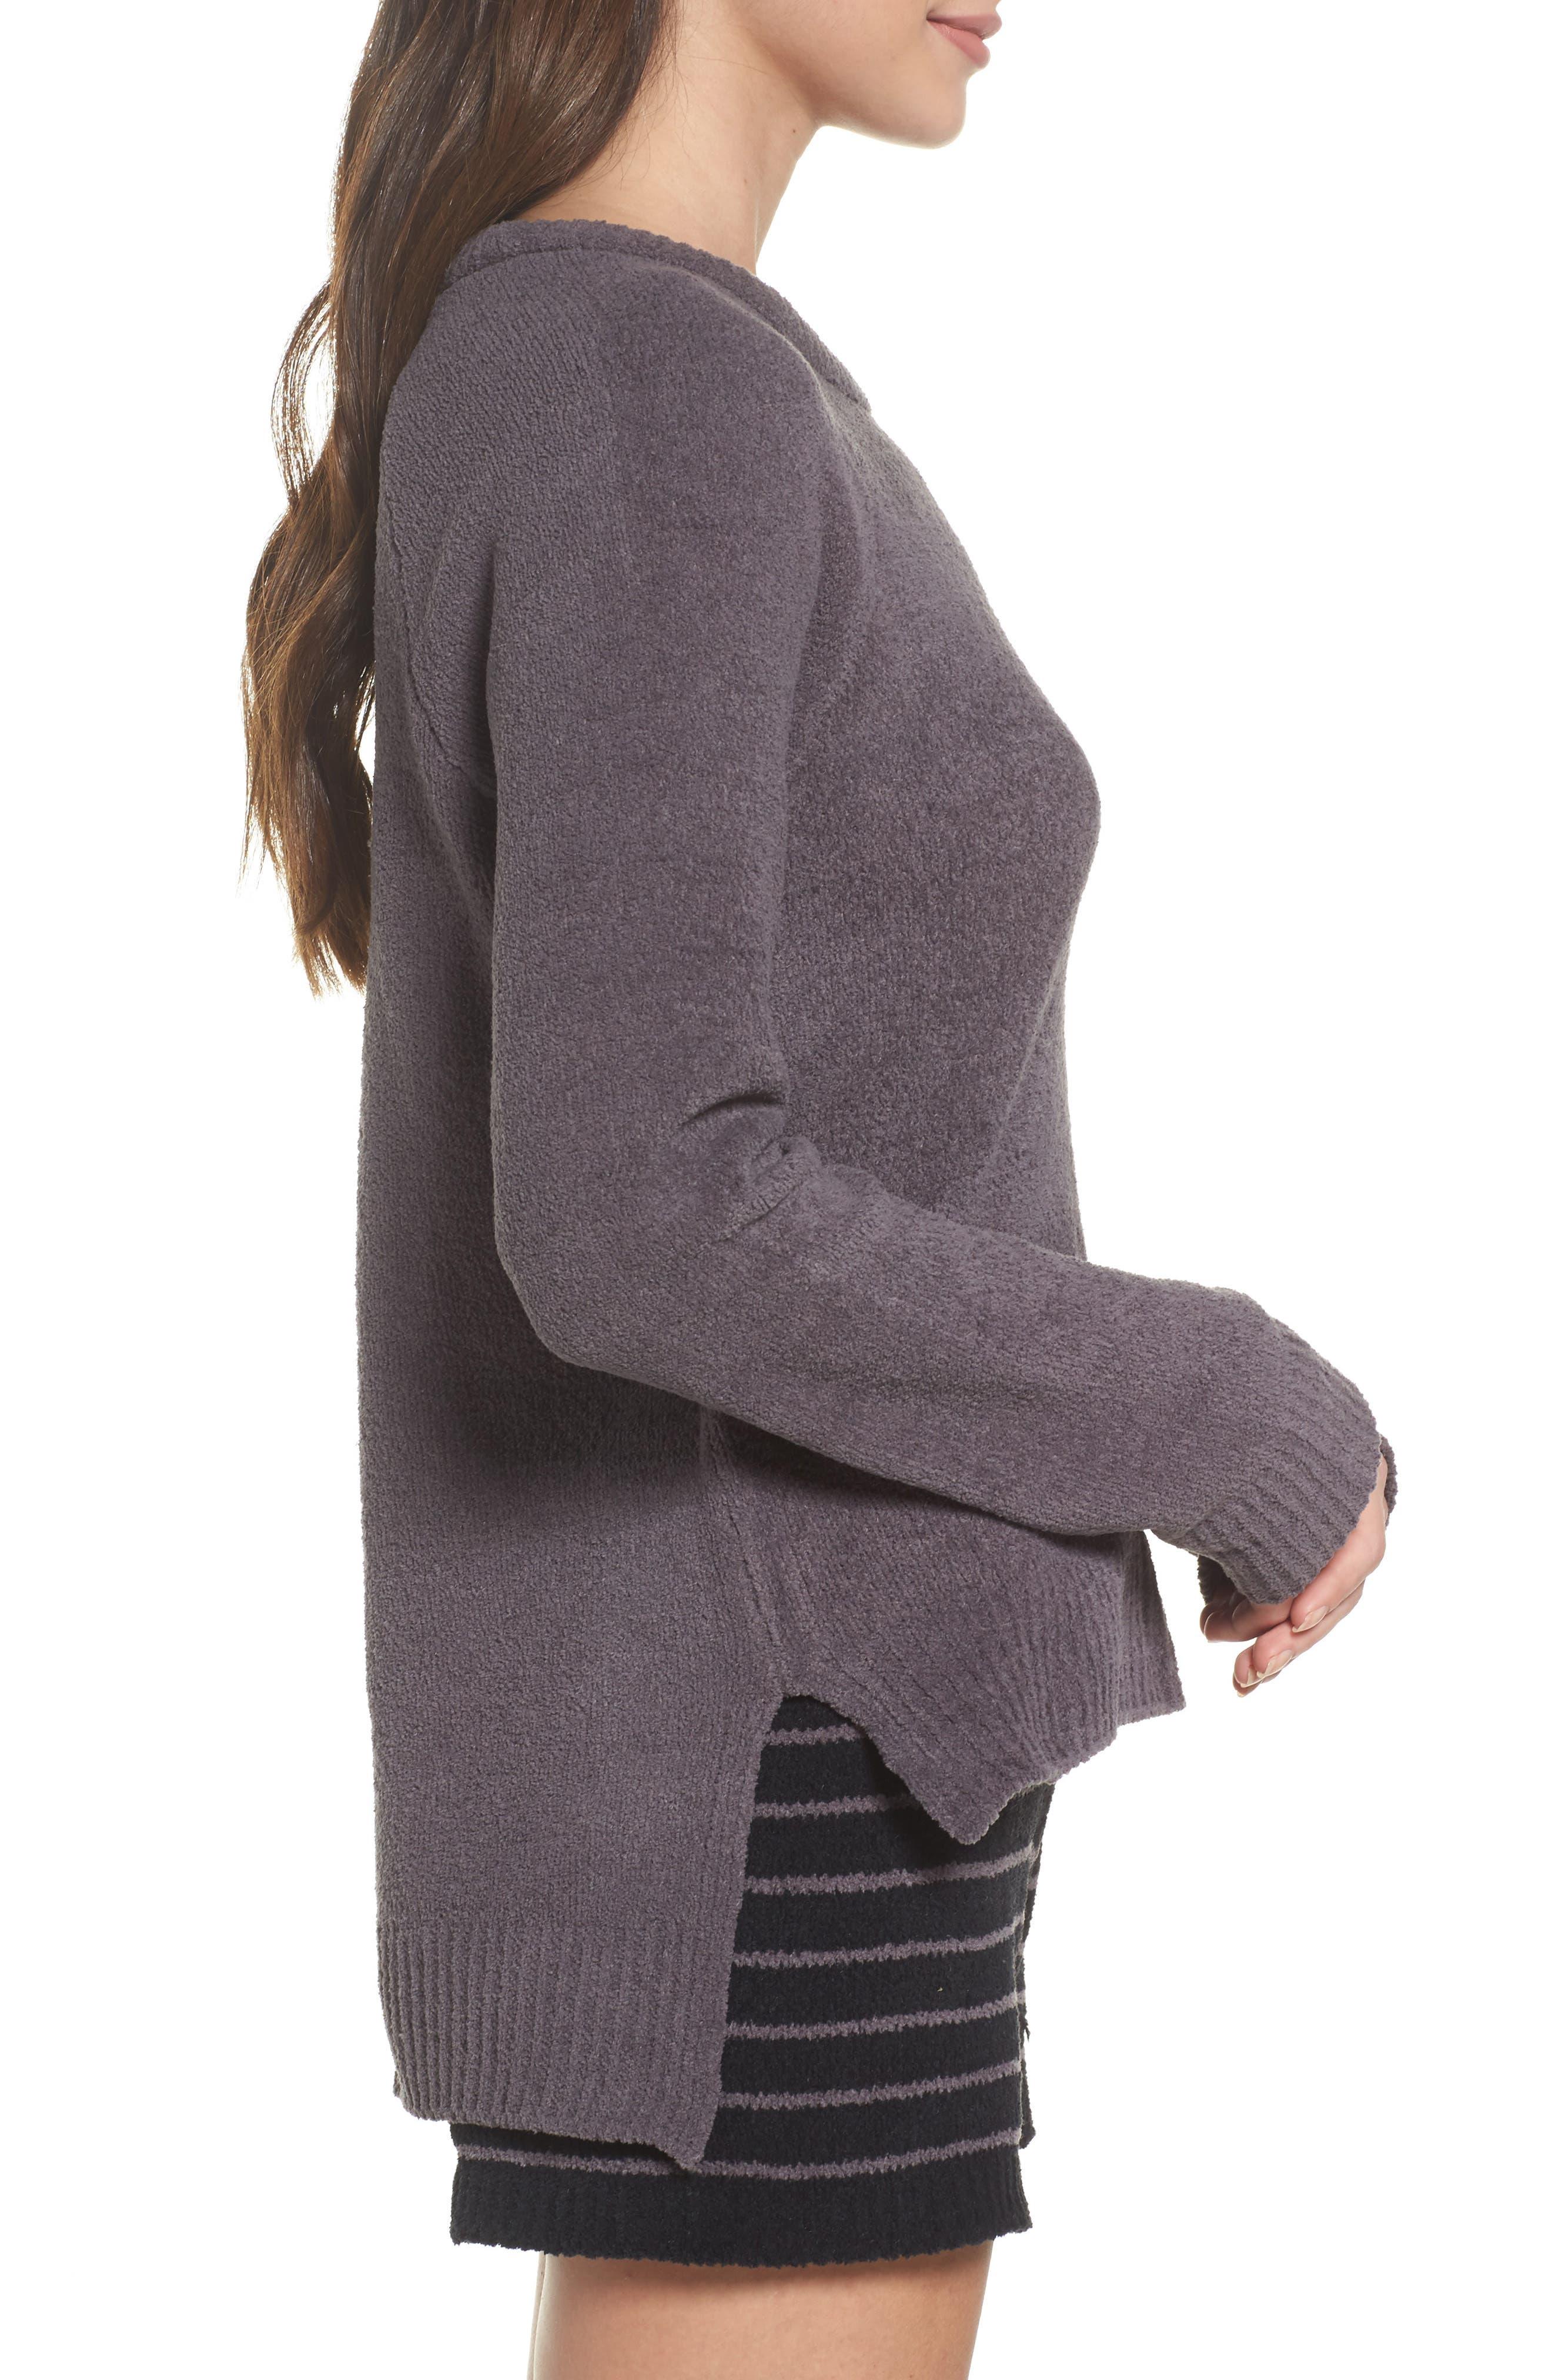 Marshmallow Sweatshirt,                             Alternate thumbnail 3, color,                             Charcoal